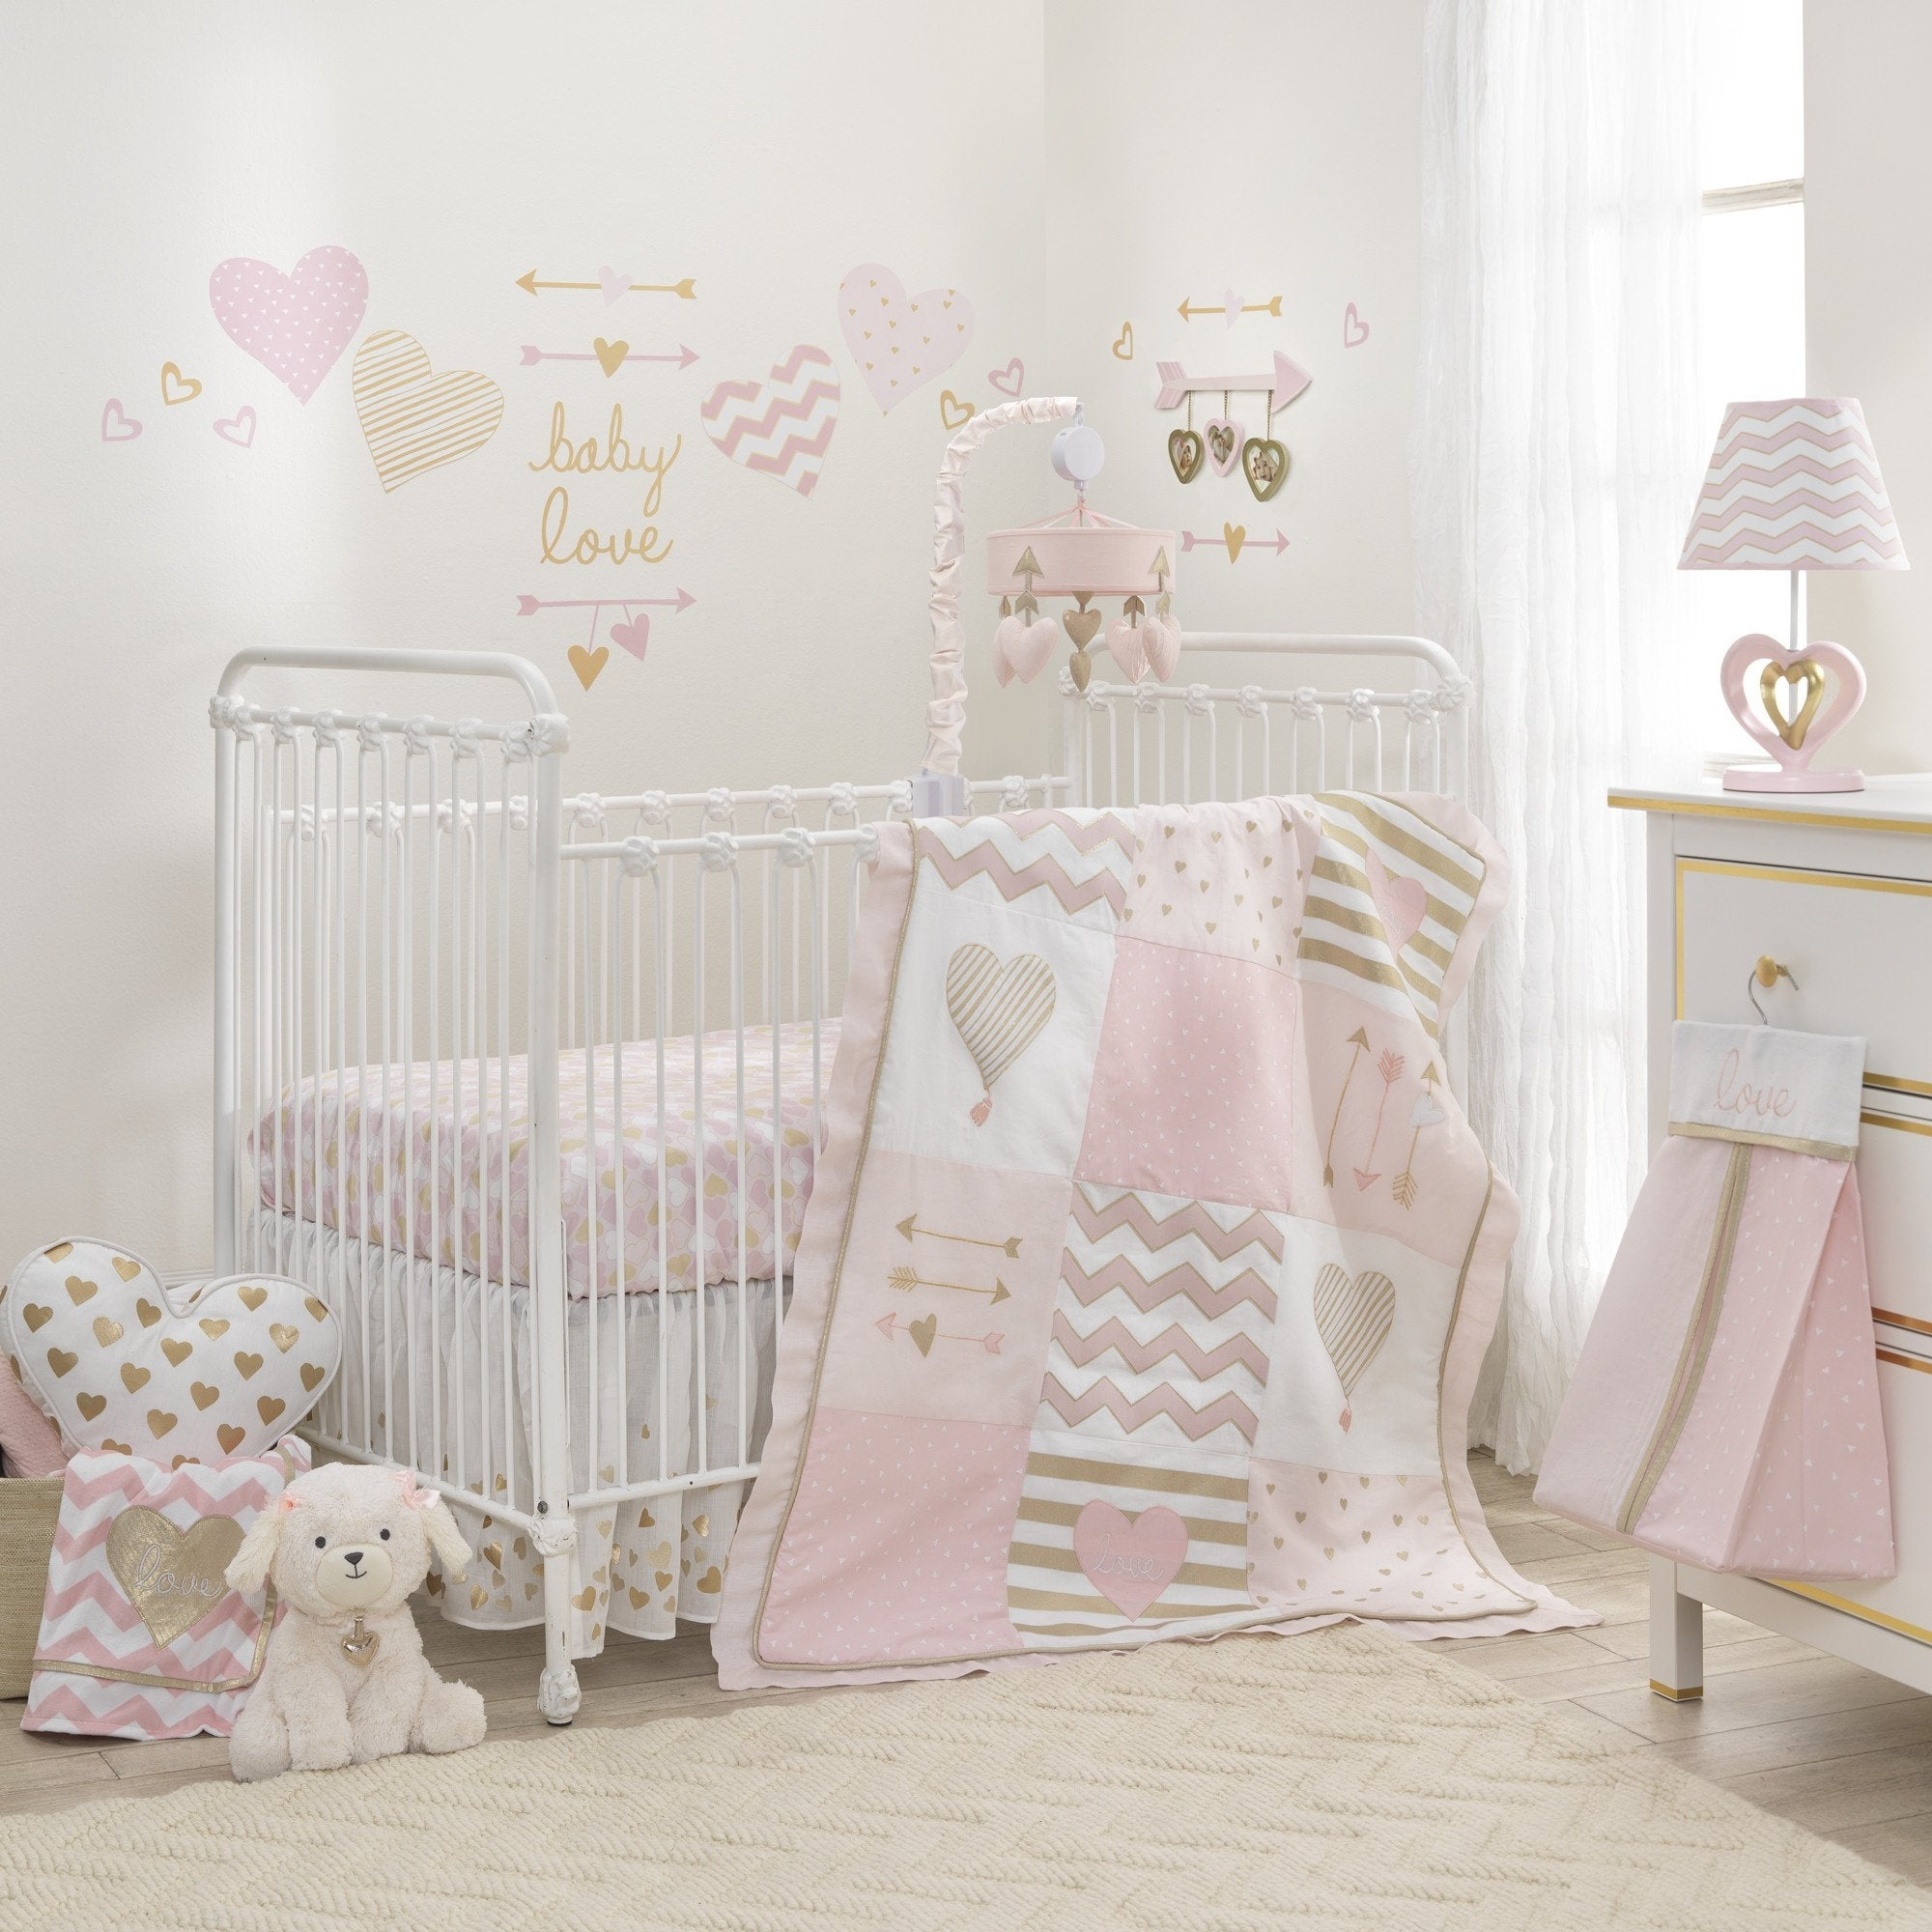 Lambs Ivy Baby Love Metallic Gold Pink White Hearts Stripes And Chevrons 4 Piece Nursery Crib Bedding Set